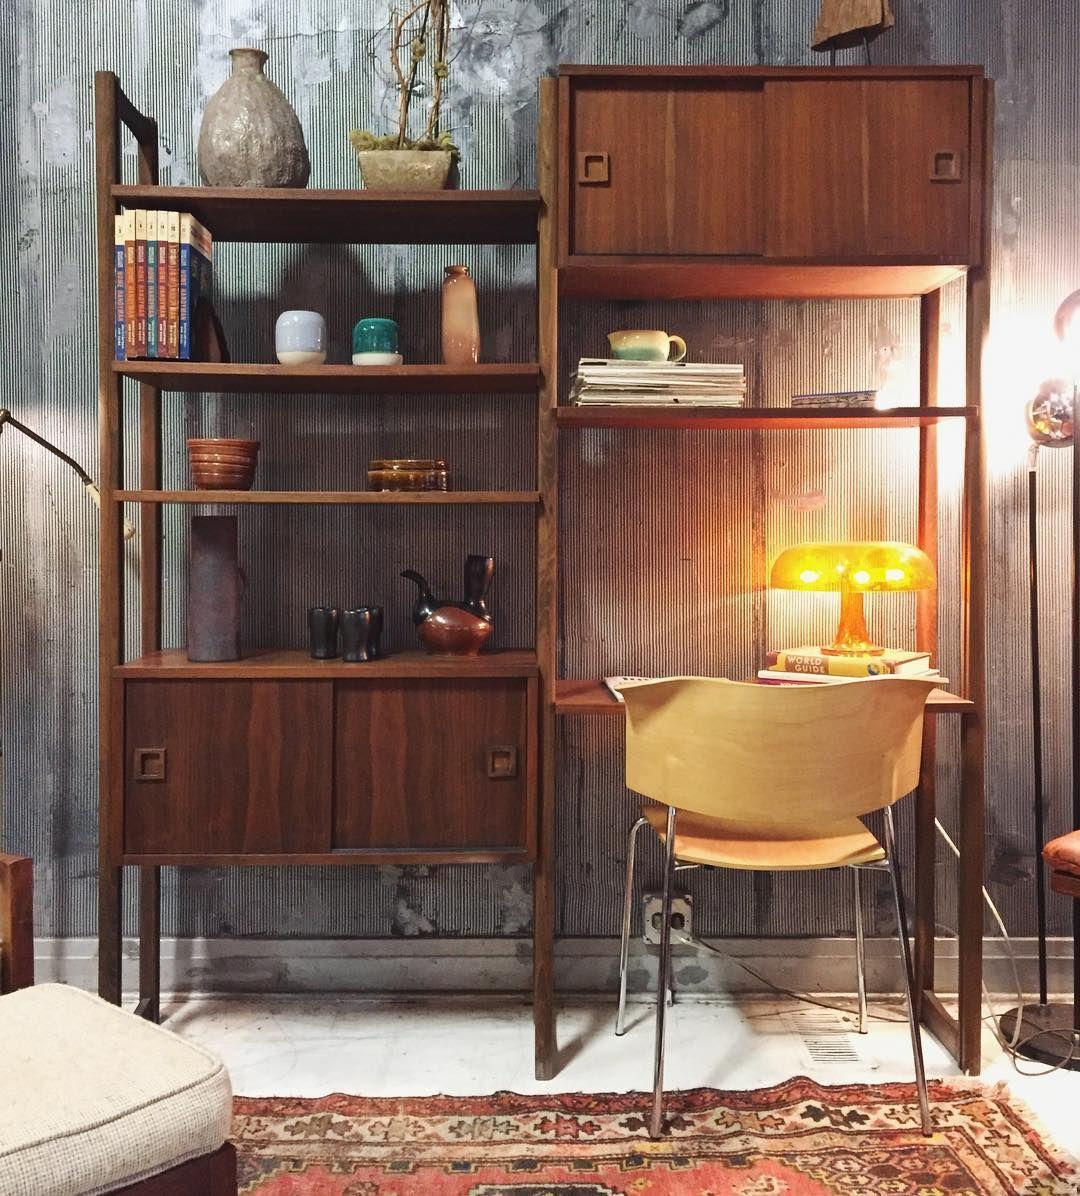 Walnut Glen Apartments: The Transparent Orange Nessino Lamp, Via @dialmformodern